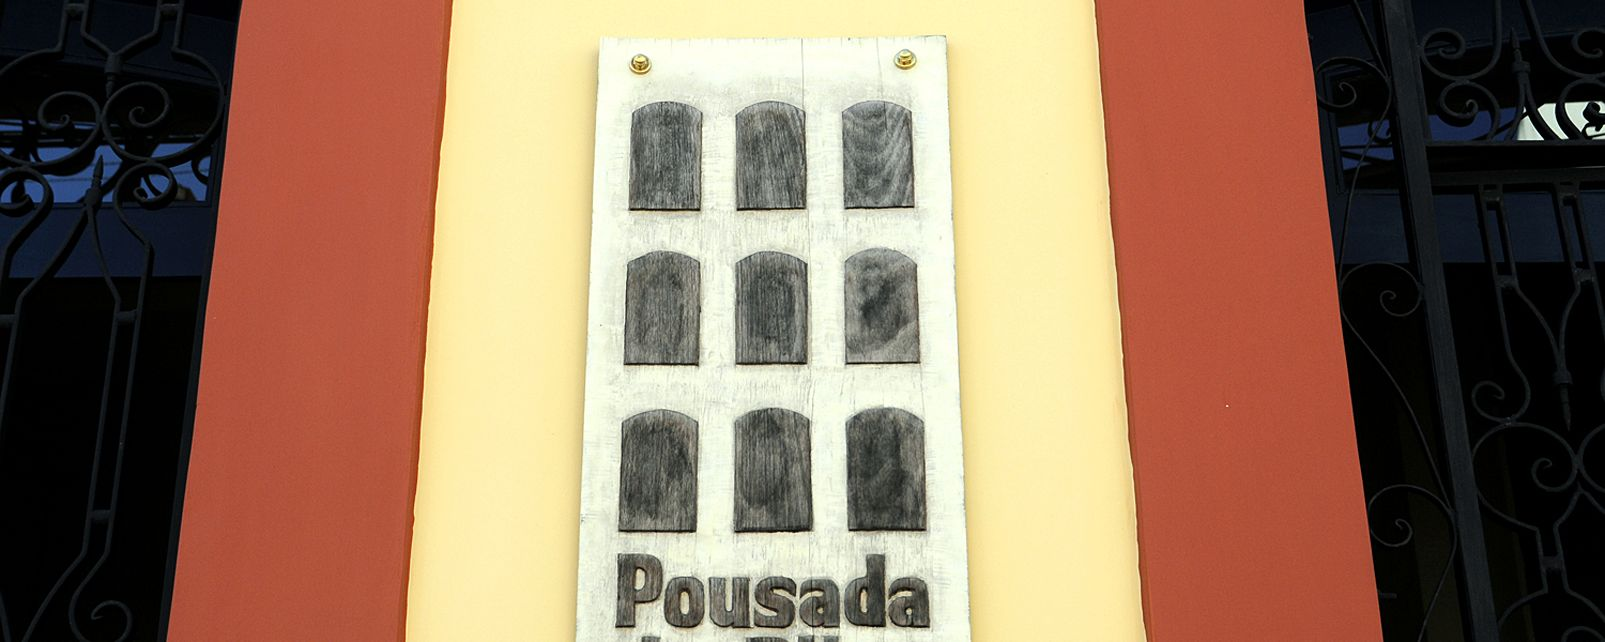 Hôtel Pousada Do Pilar